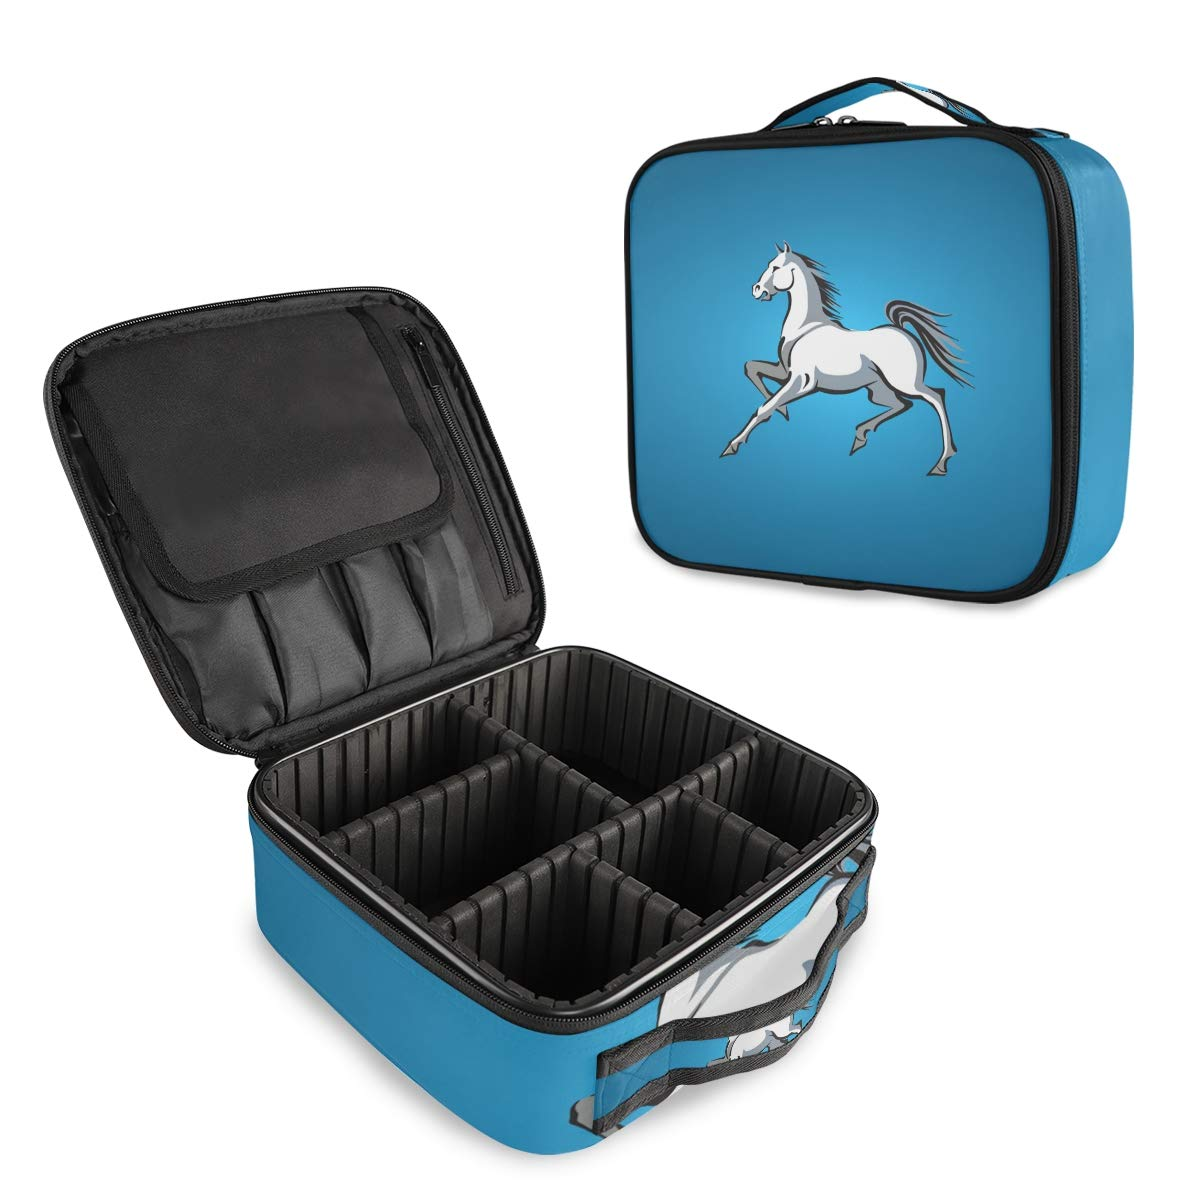 Bombing new work Travel Makeup Case White Horse Train Organizer Max 51% OFF Portable